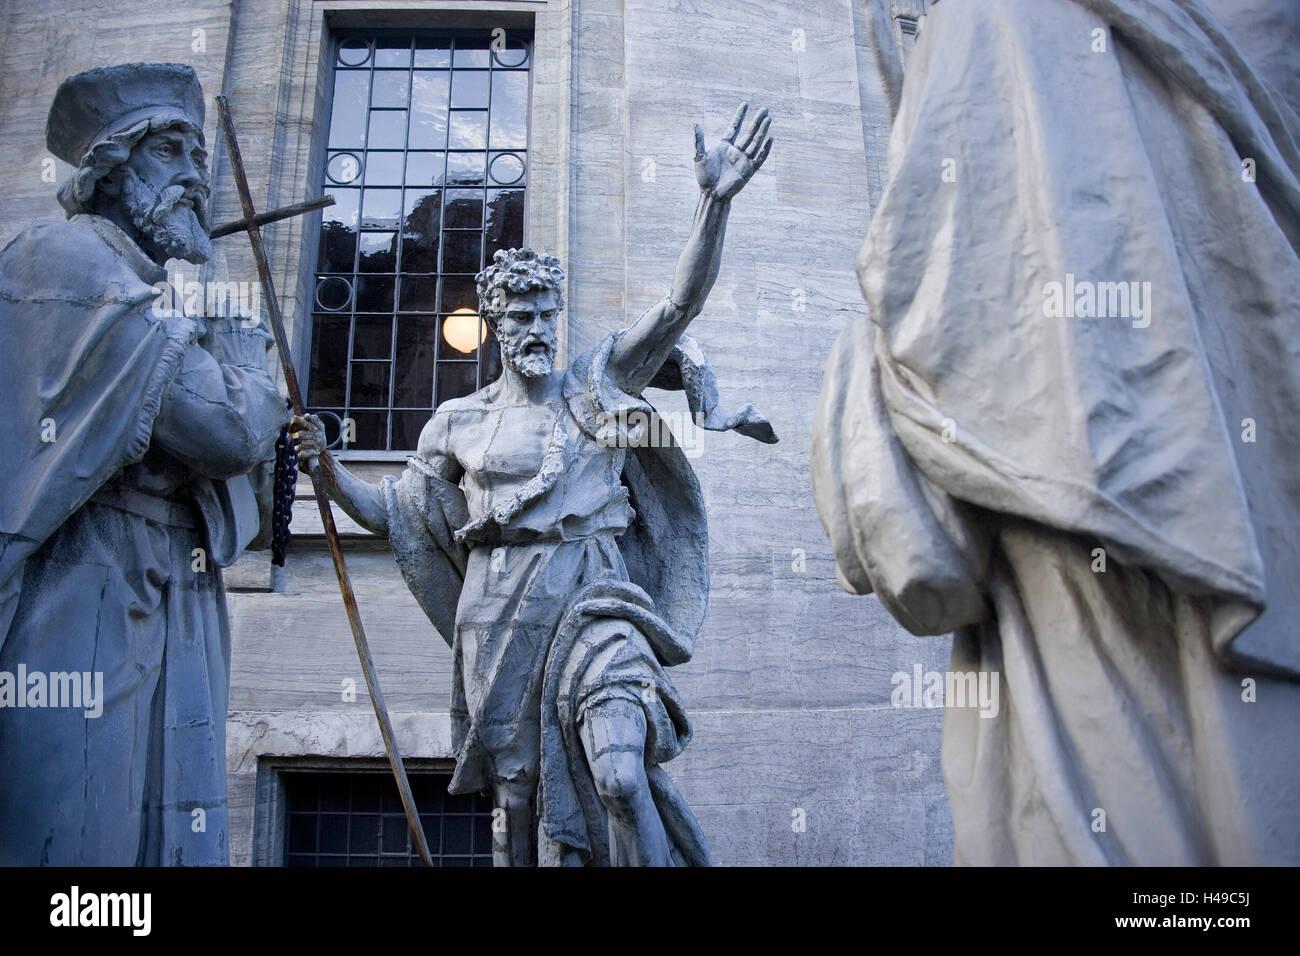 Denmark, Copenhagen, Frederikskirken, statues, detail, capital, marble church, church, structure, iron fence, freeze - Stock Image